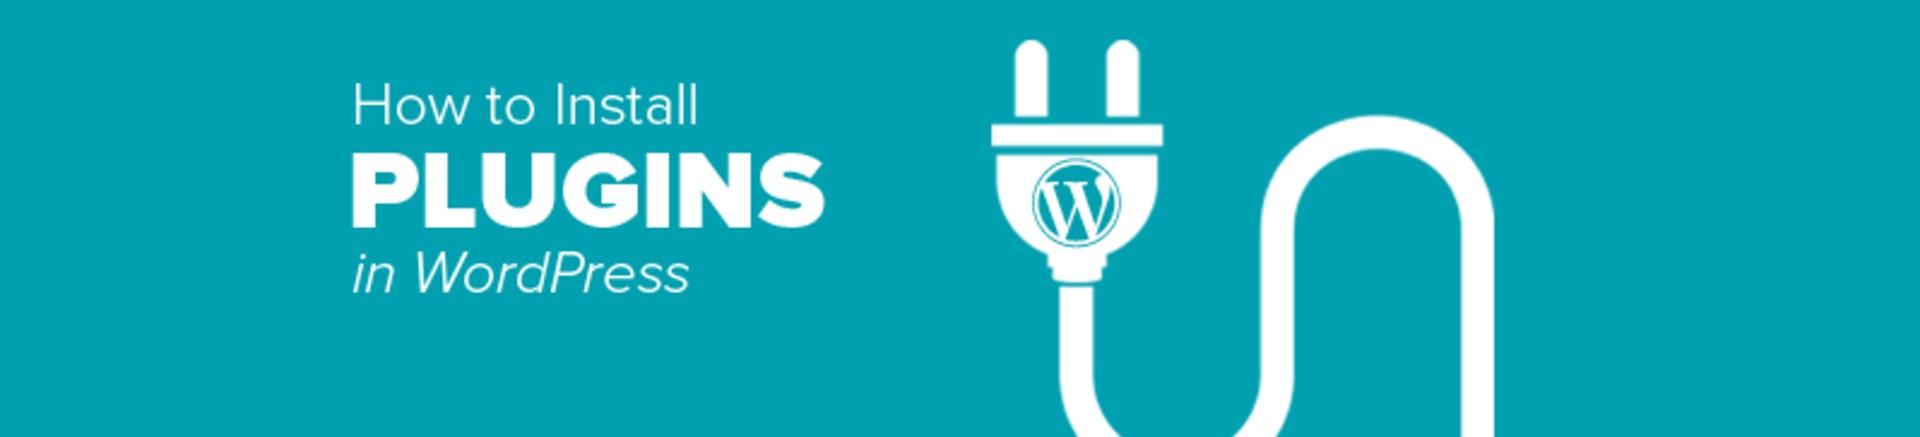 instll-pluginwordpress-2